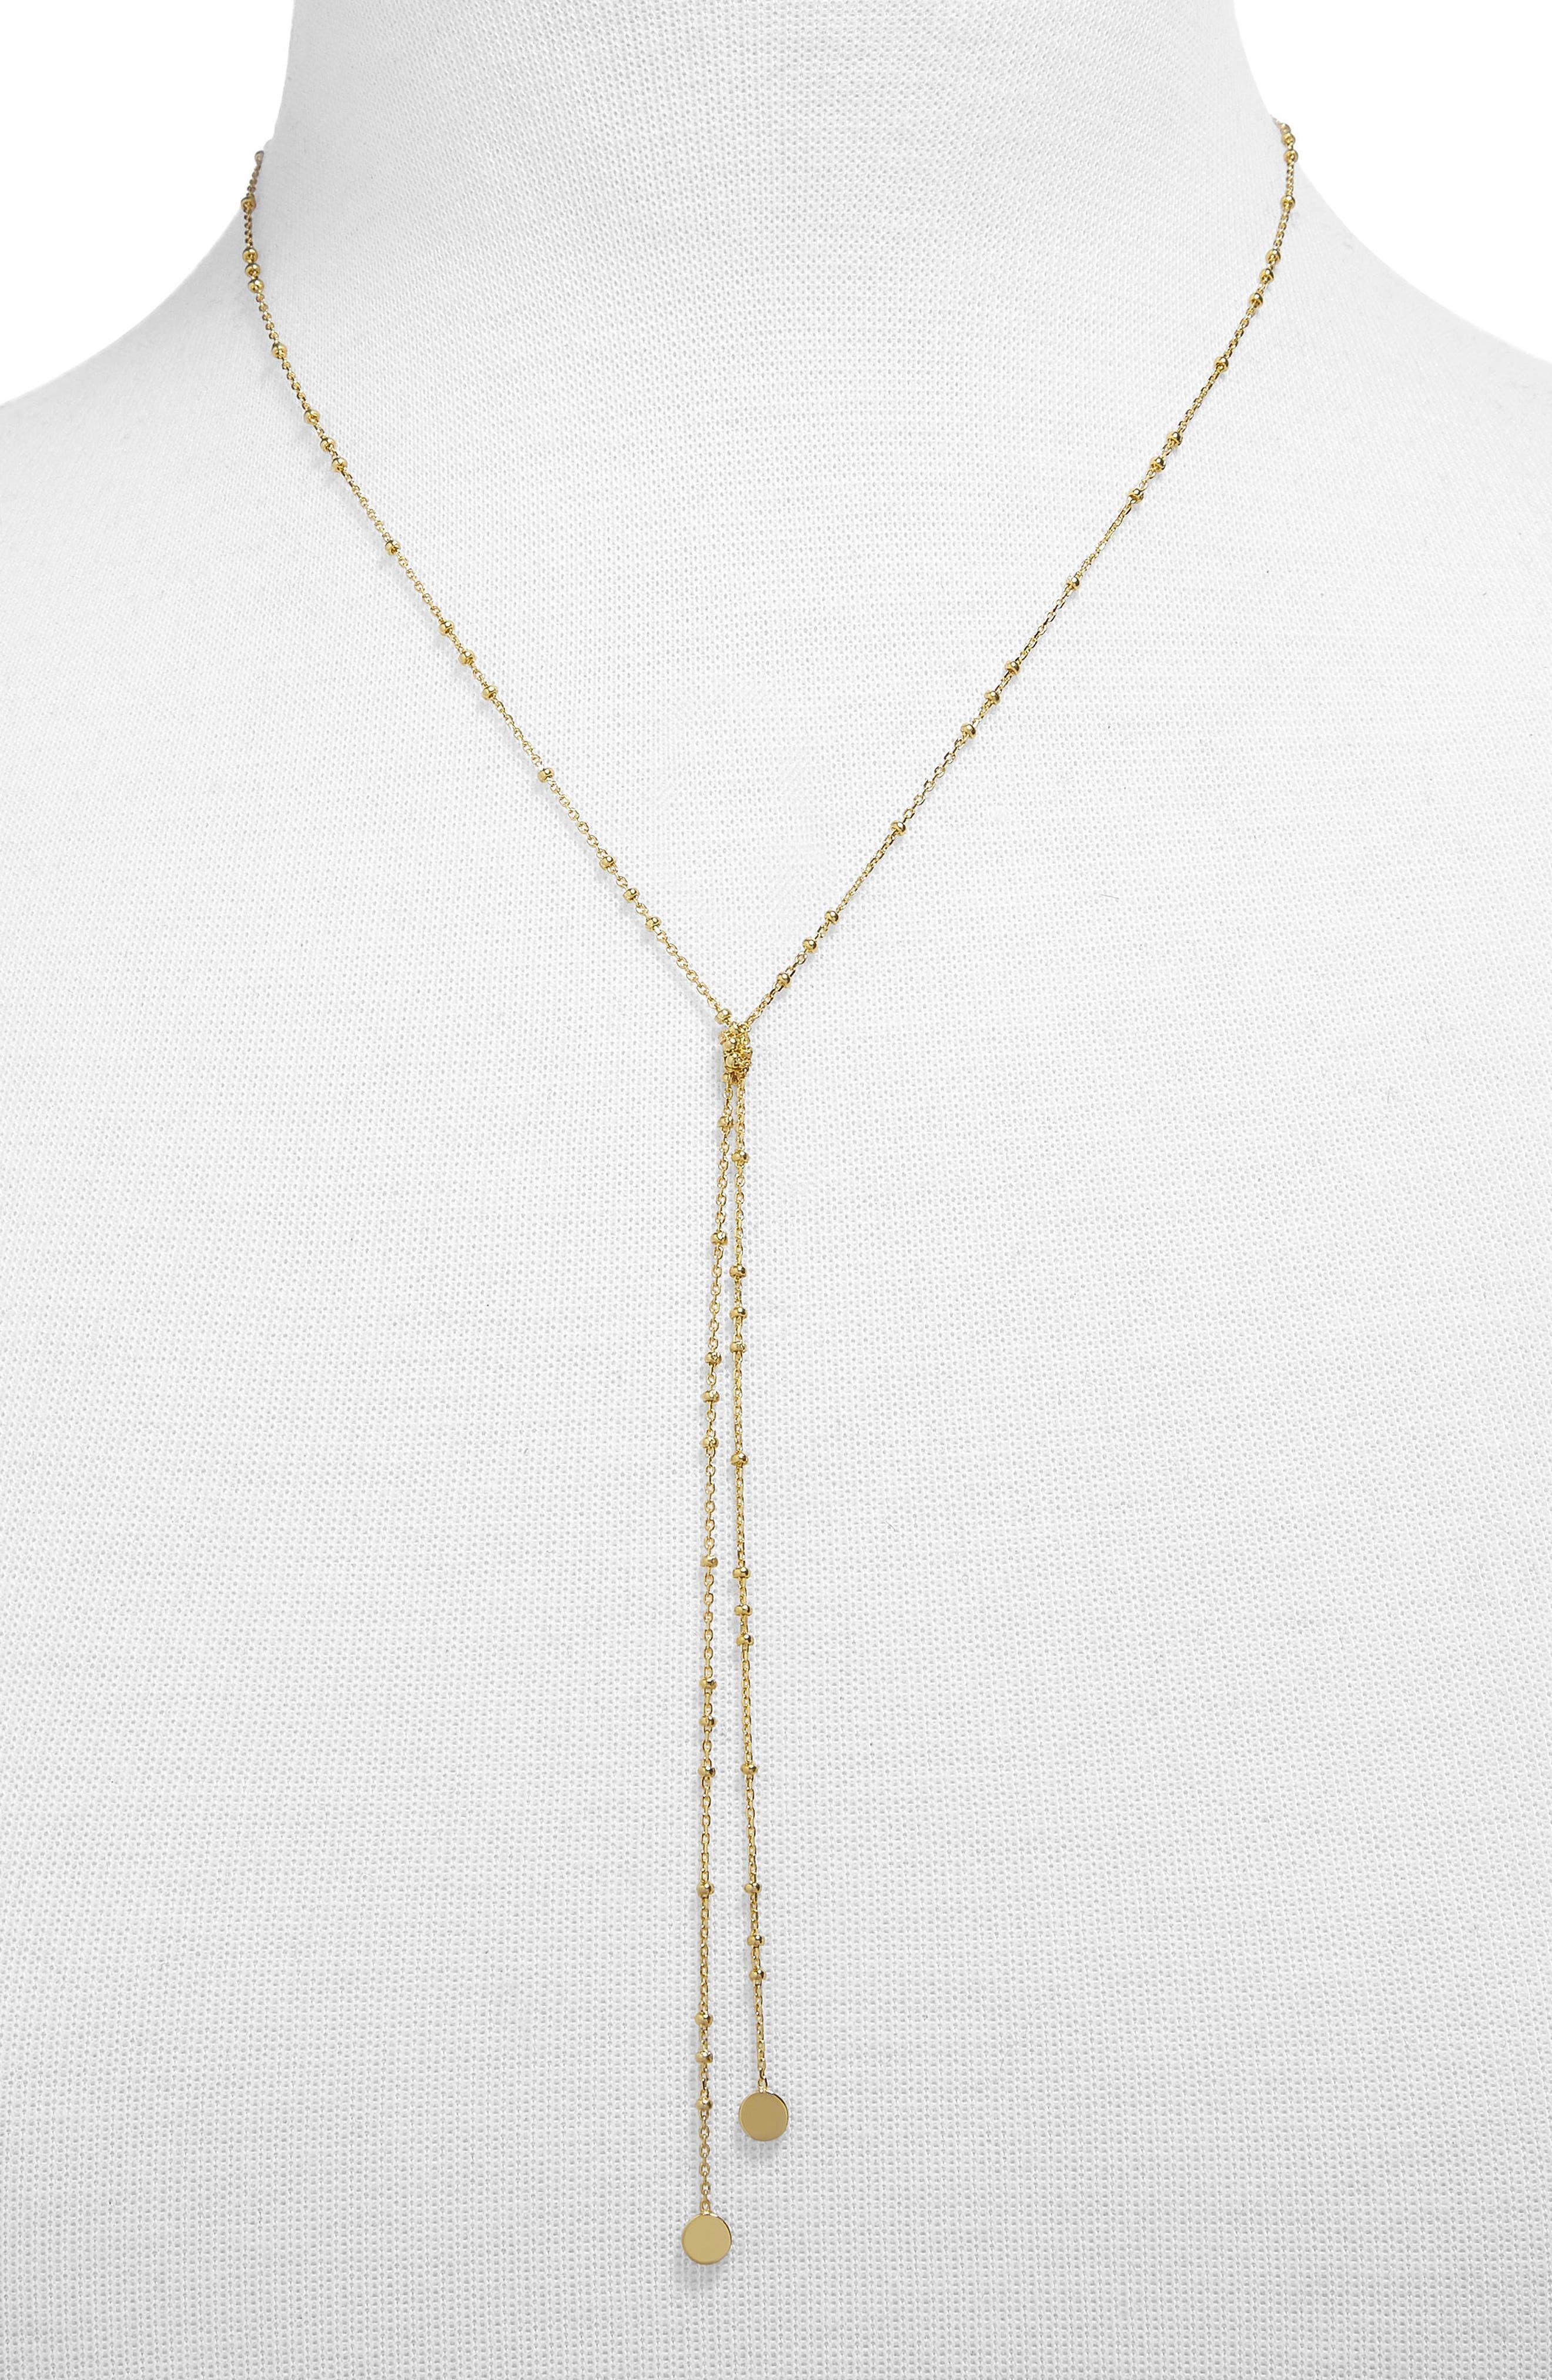 Palla Lariat Necklace,                         Main,                         color, 718